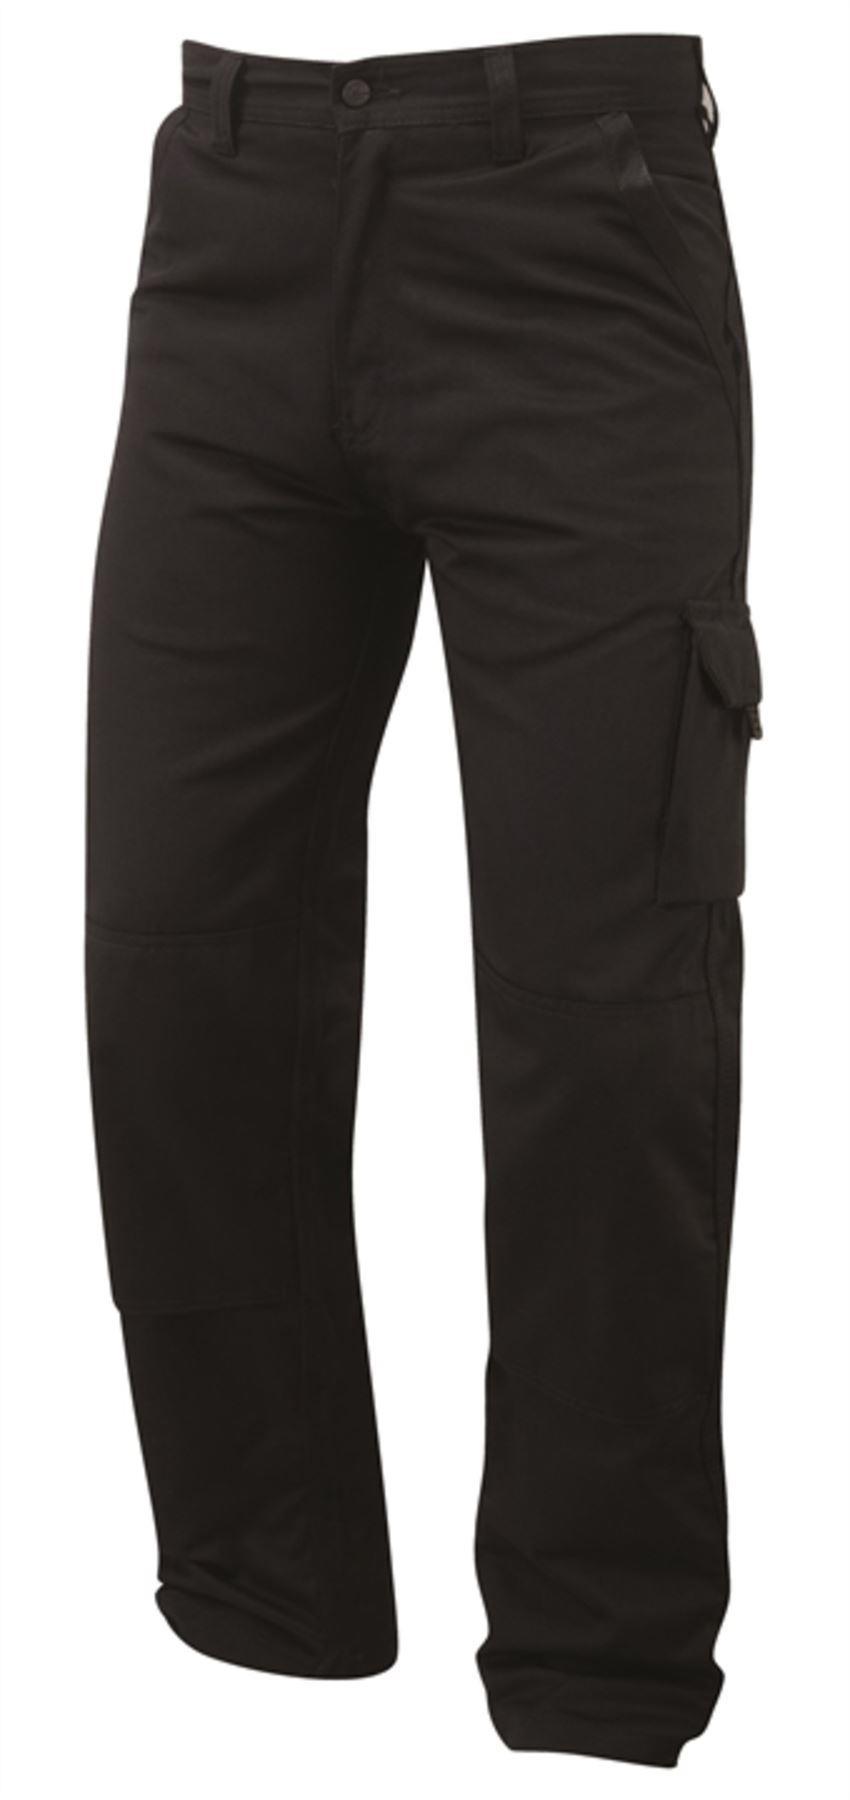 Orn Heron Kneepad Combat Trousers - Black|48W35L